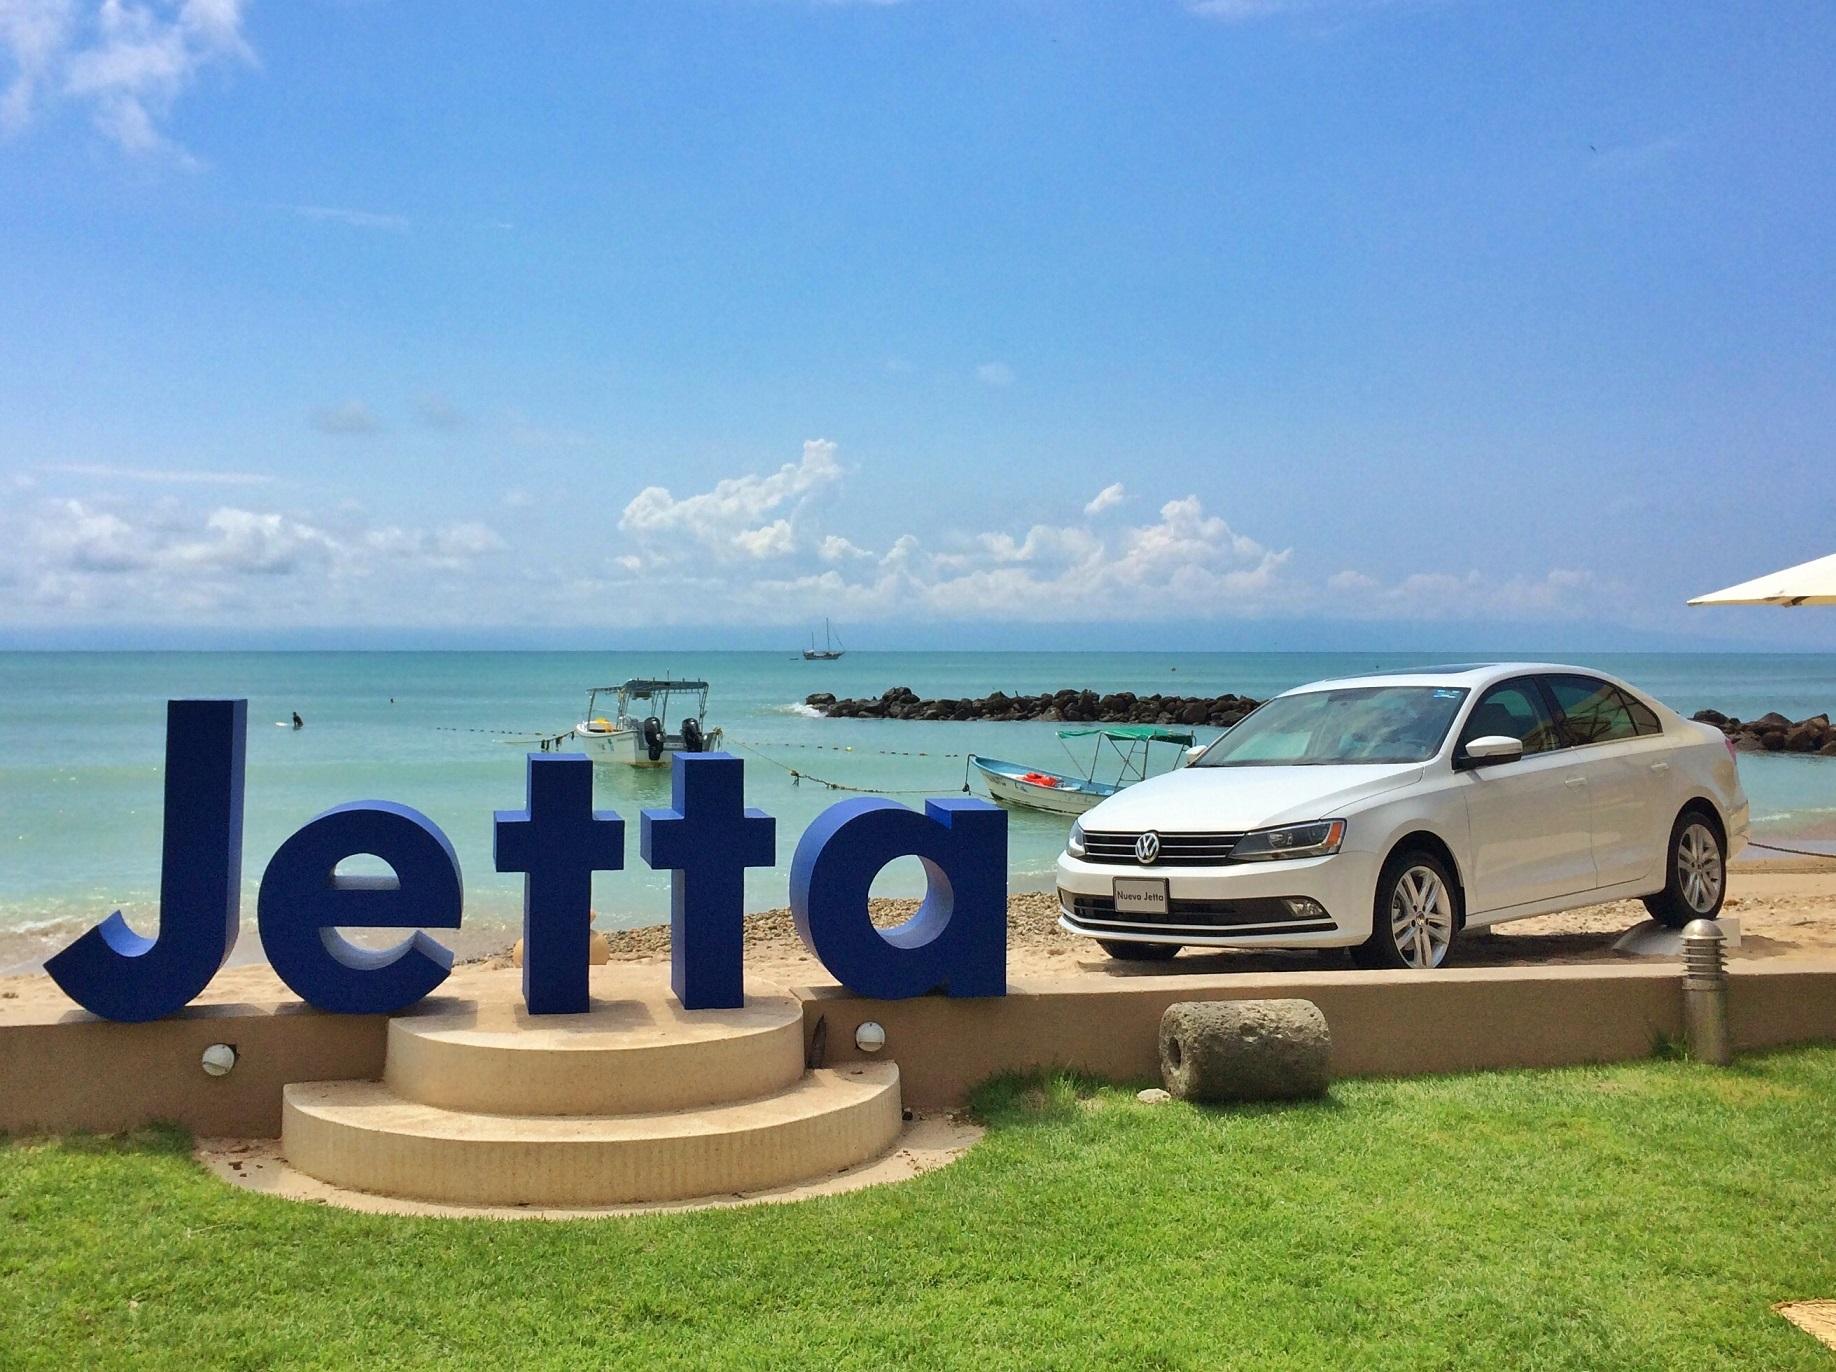 Noticias: Nuevo Volkswagen Jetta 2015